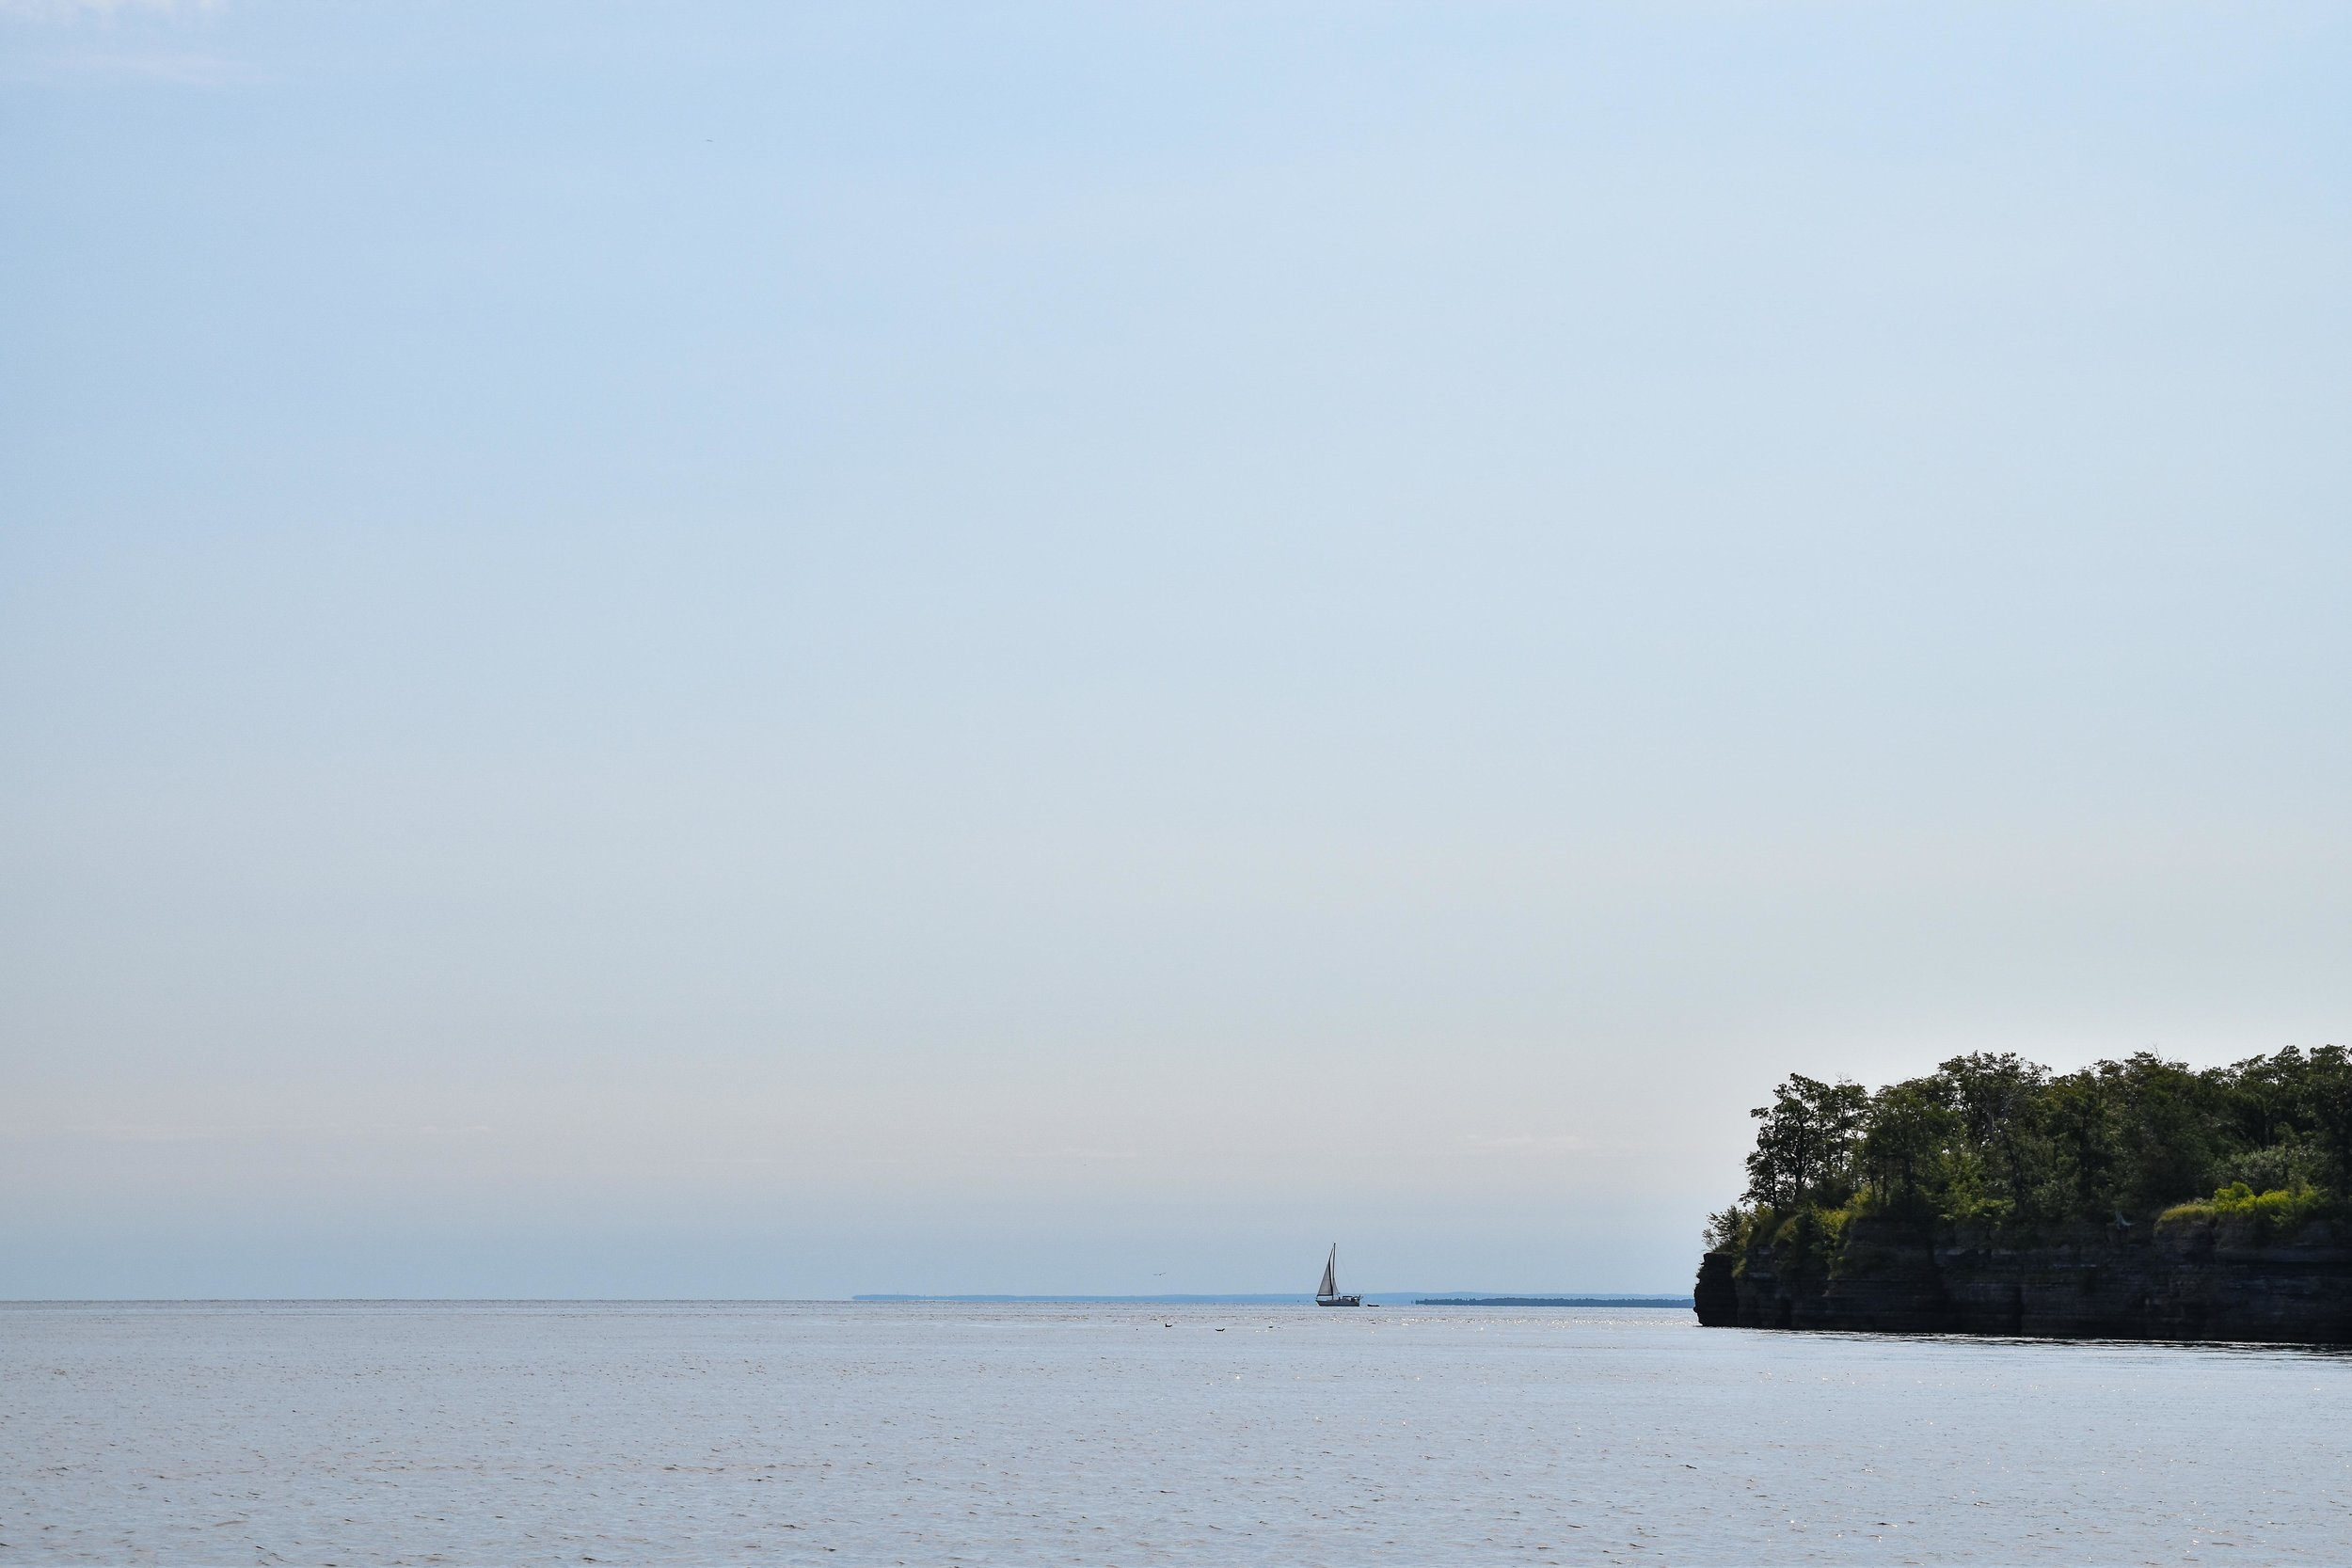 Duck Island, Lake Ontario